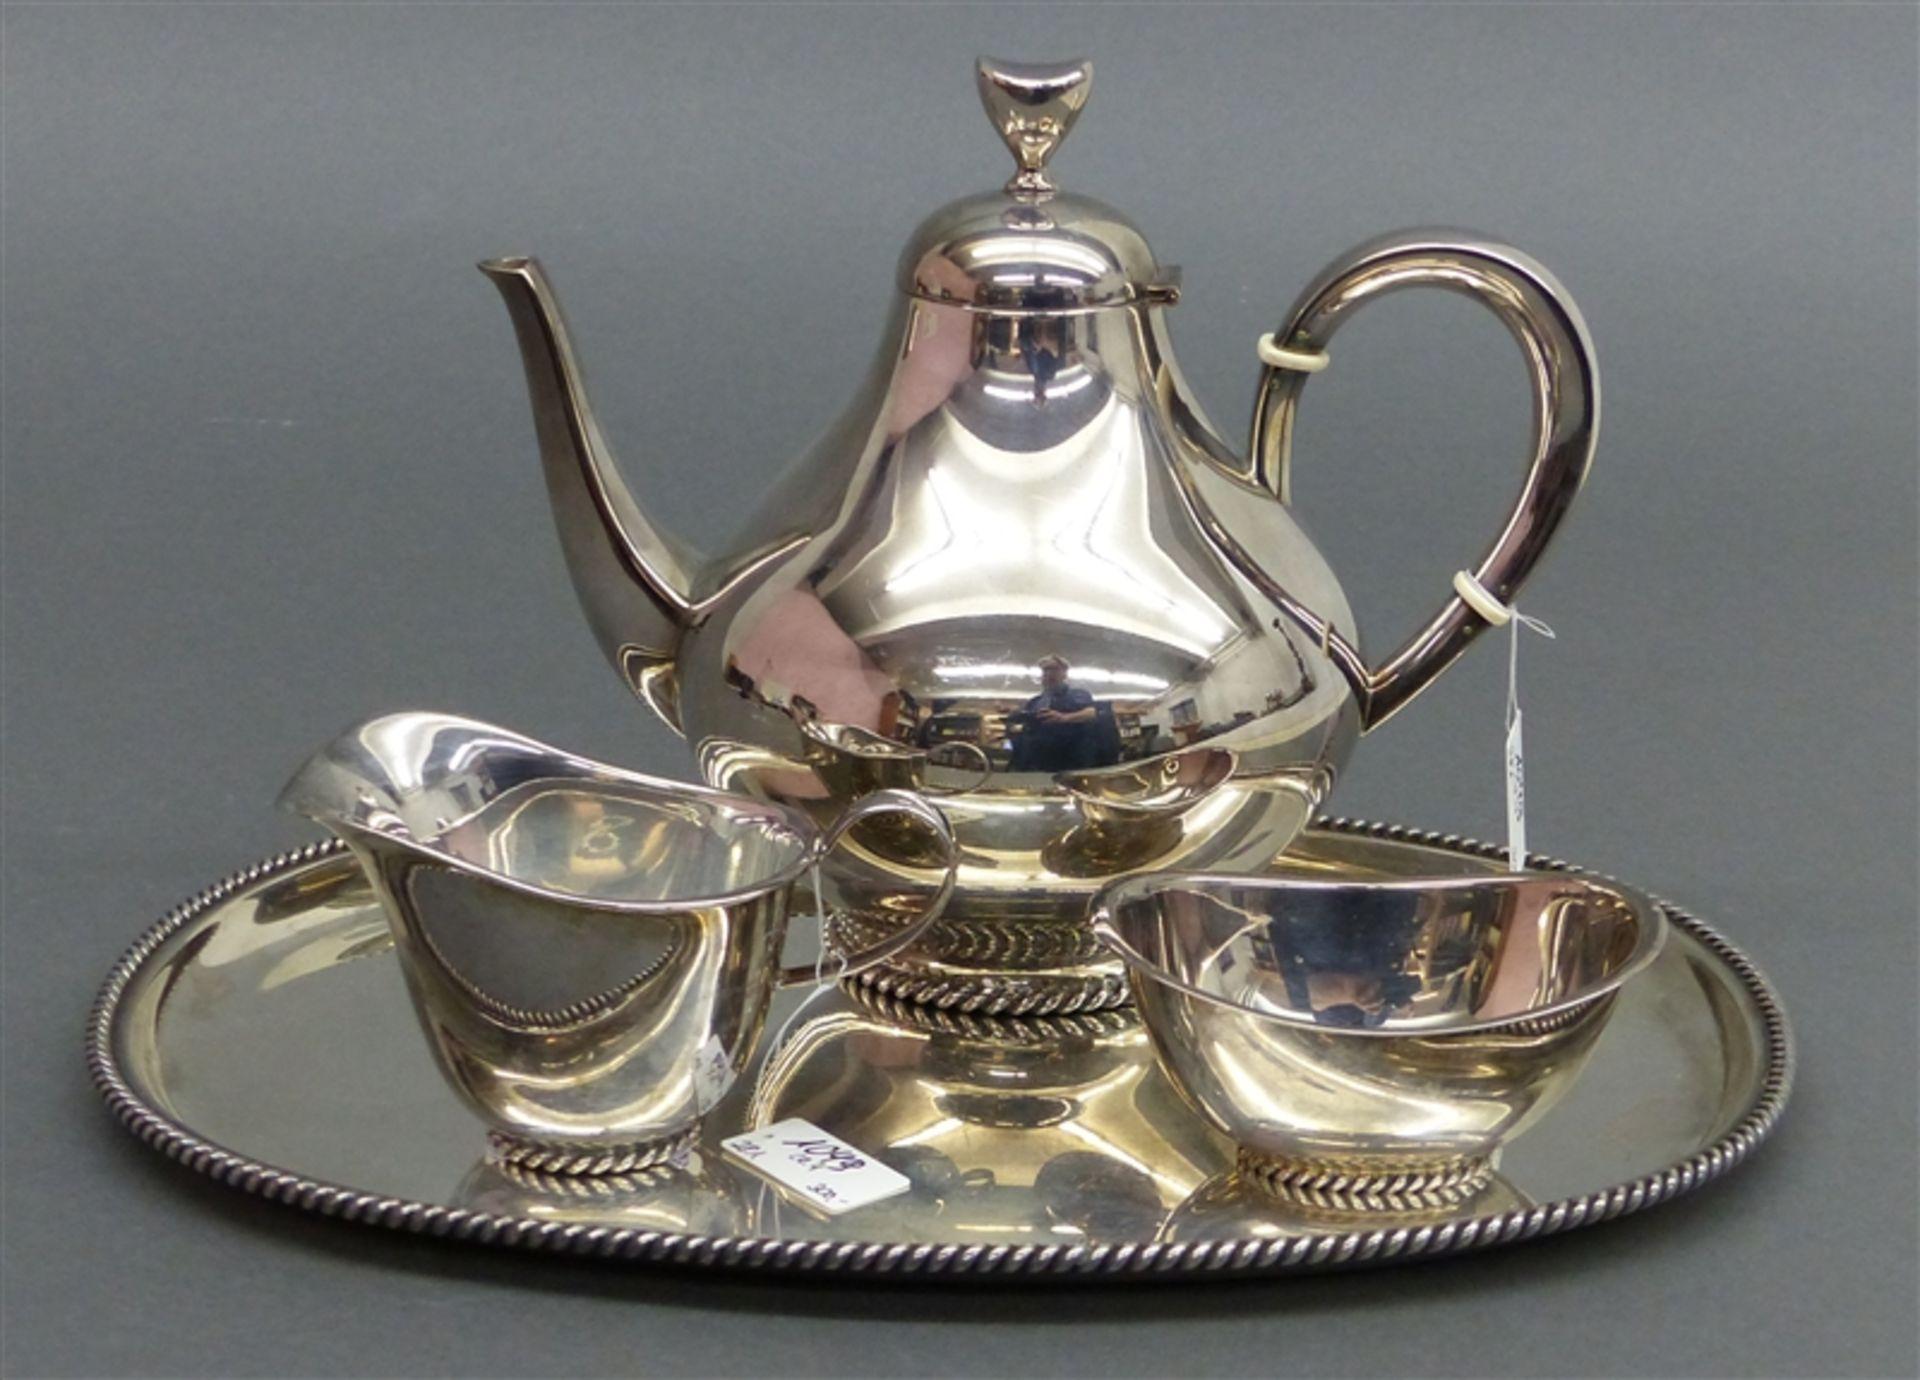 Kaffeeservice Silber, vierteilig Milchkännchen, Tablett, Perldekor, um 1950, punziert, Fa.